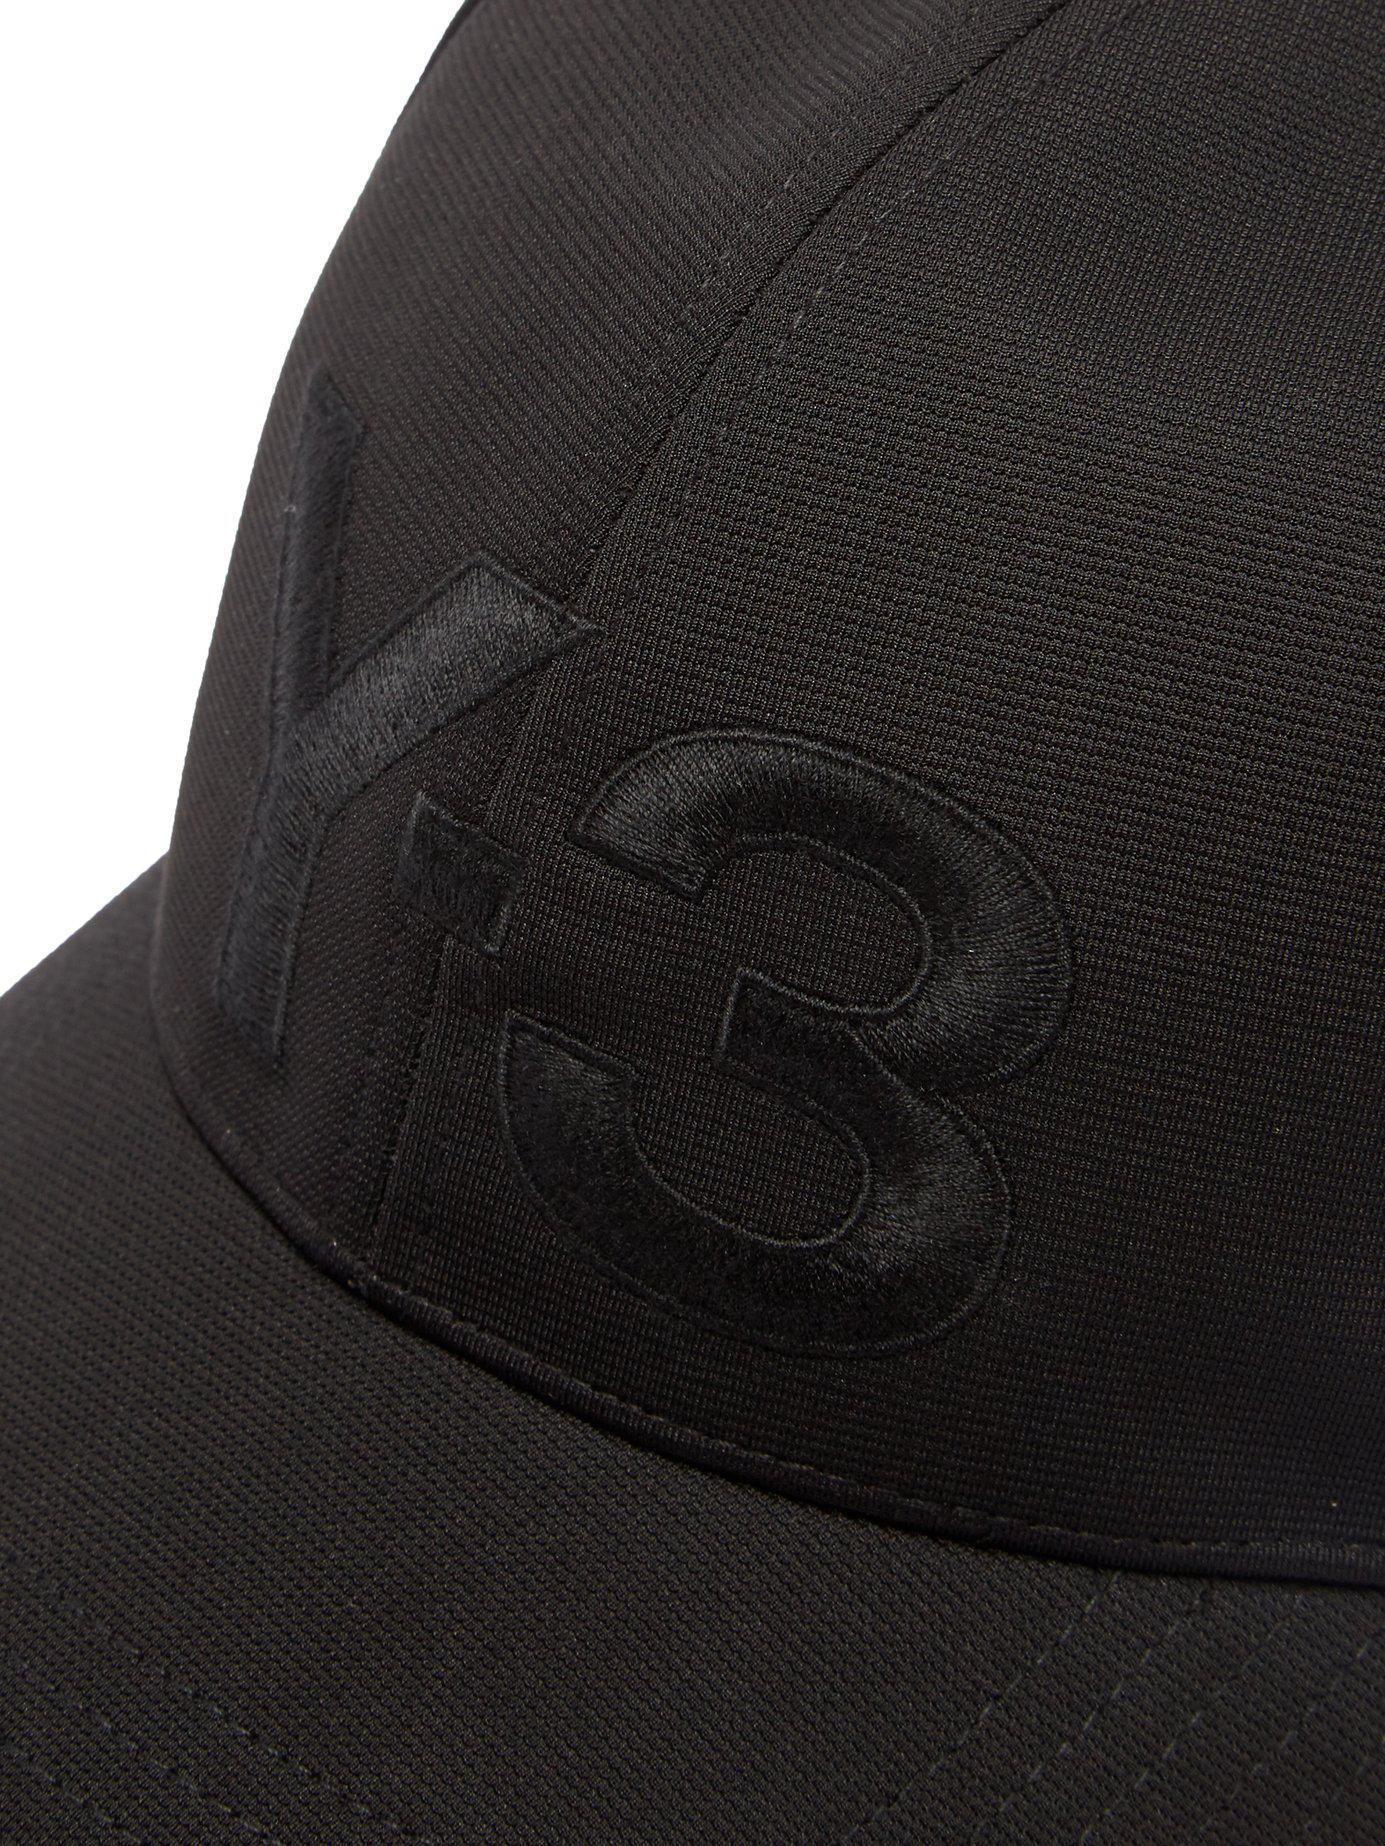 ec93079ec Lyst - Y-3 Logo Embroidered Cap in Black for Men